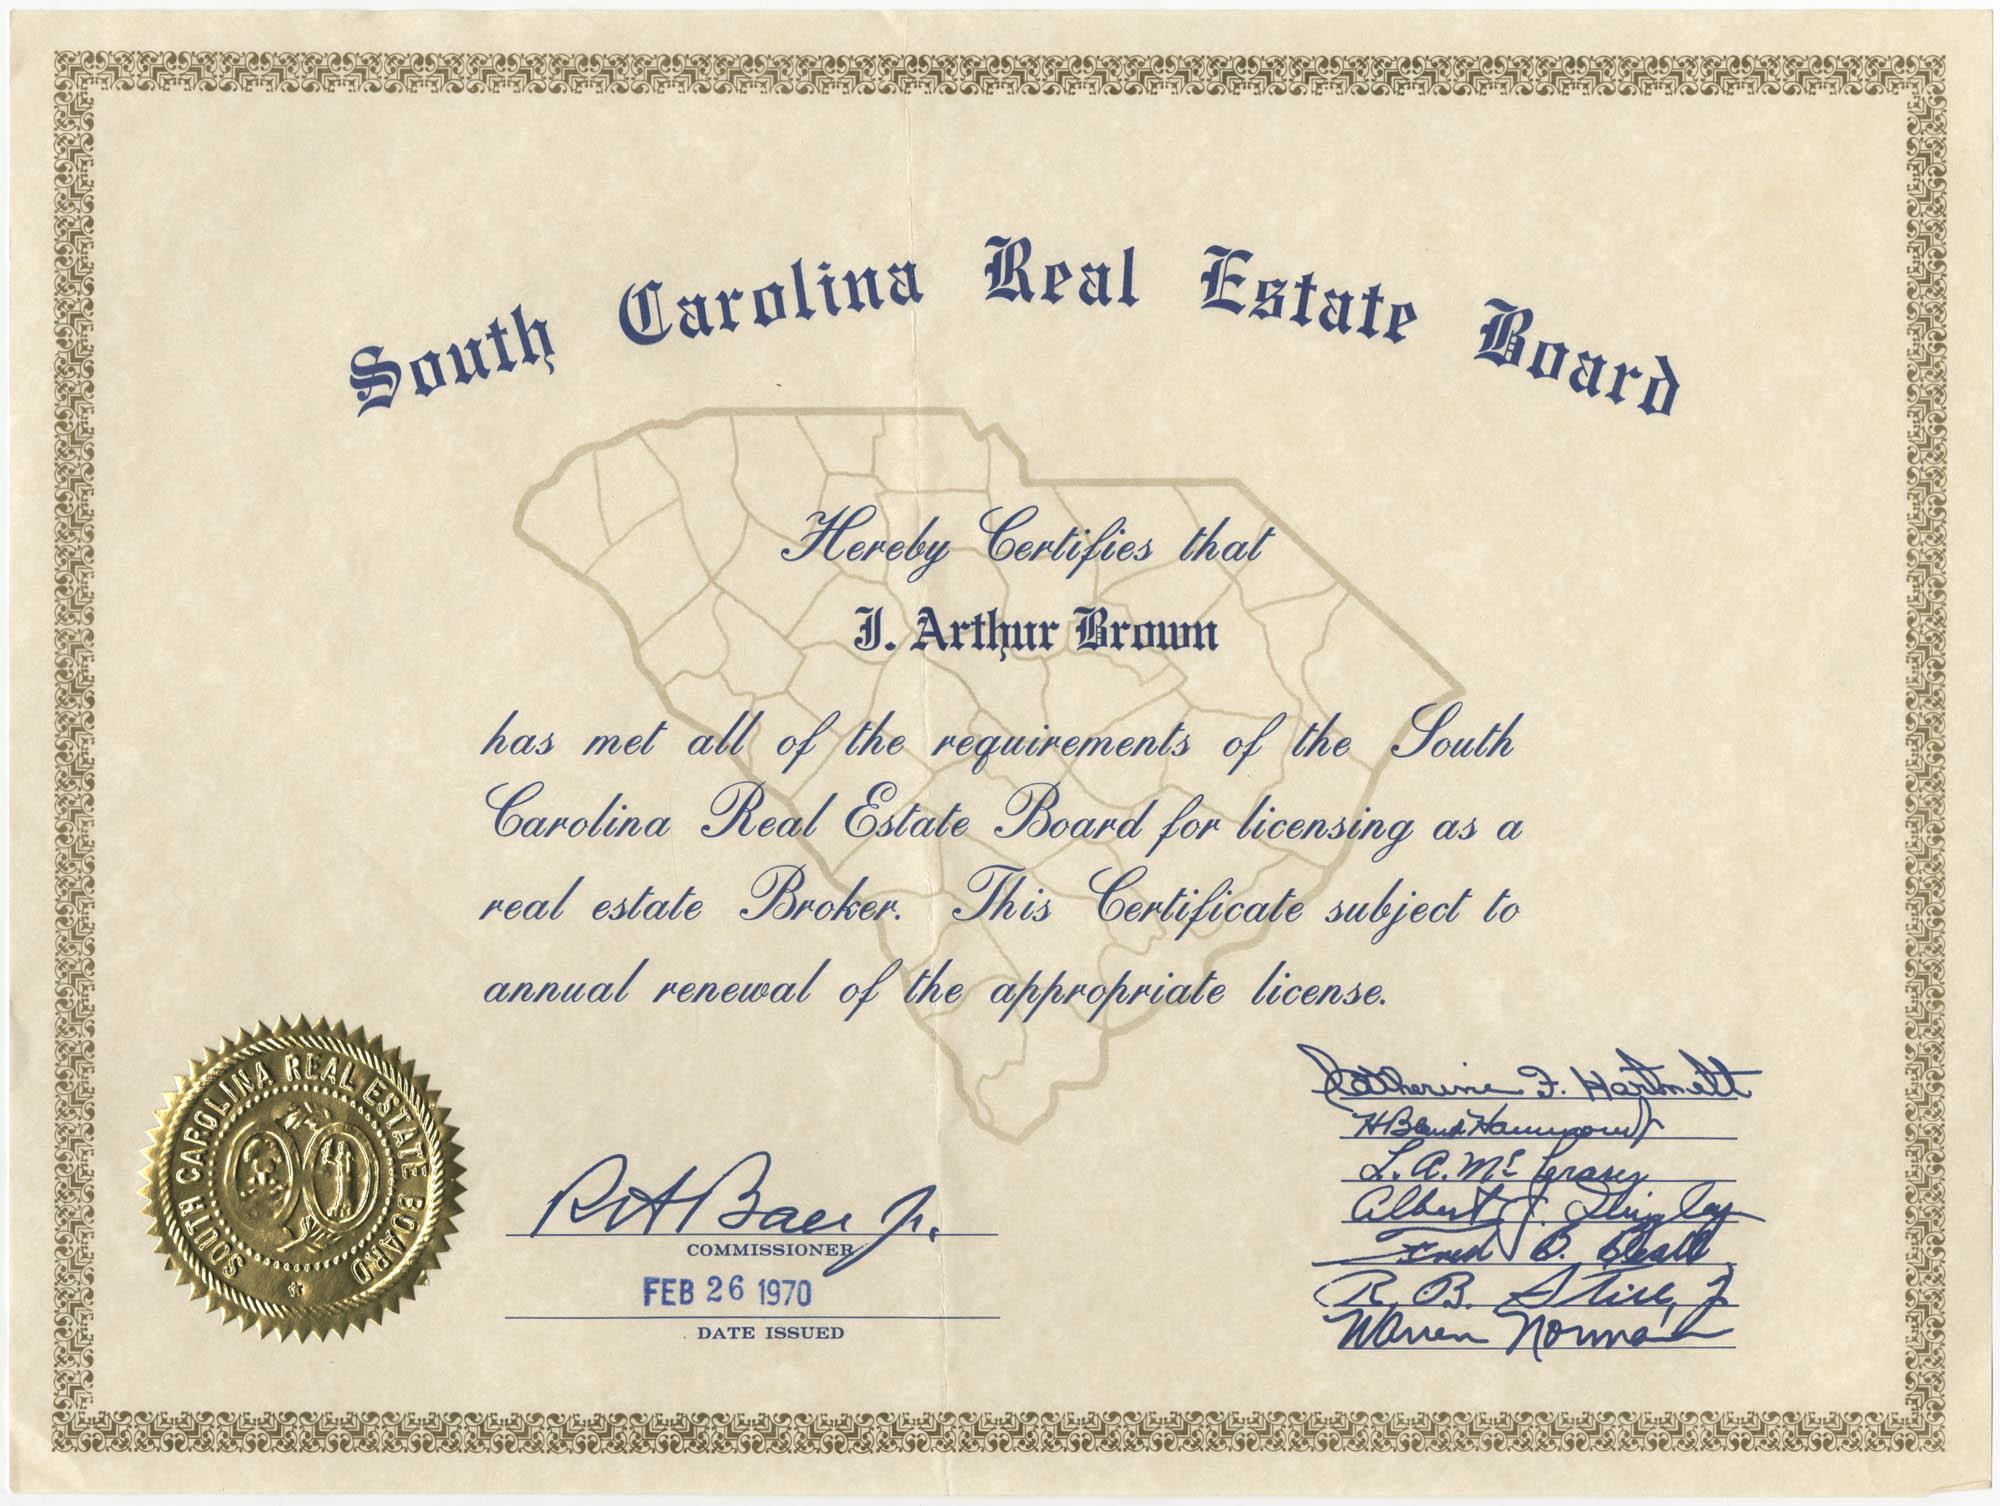 South Carolina Real Estate Board Certificate for J. Arthur Brown, February 26, 1970